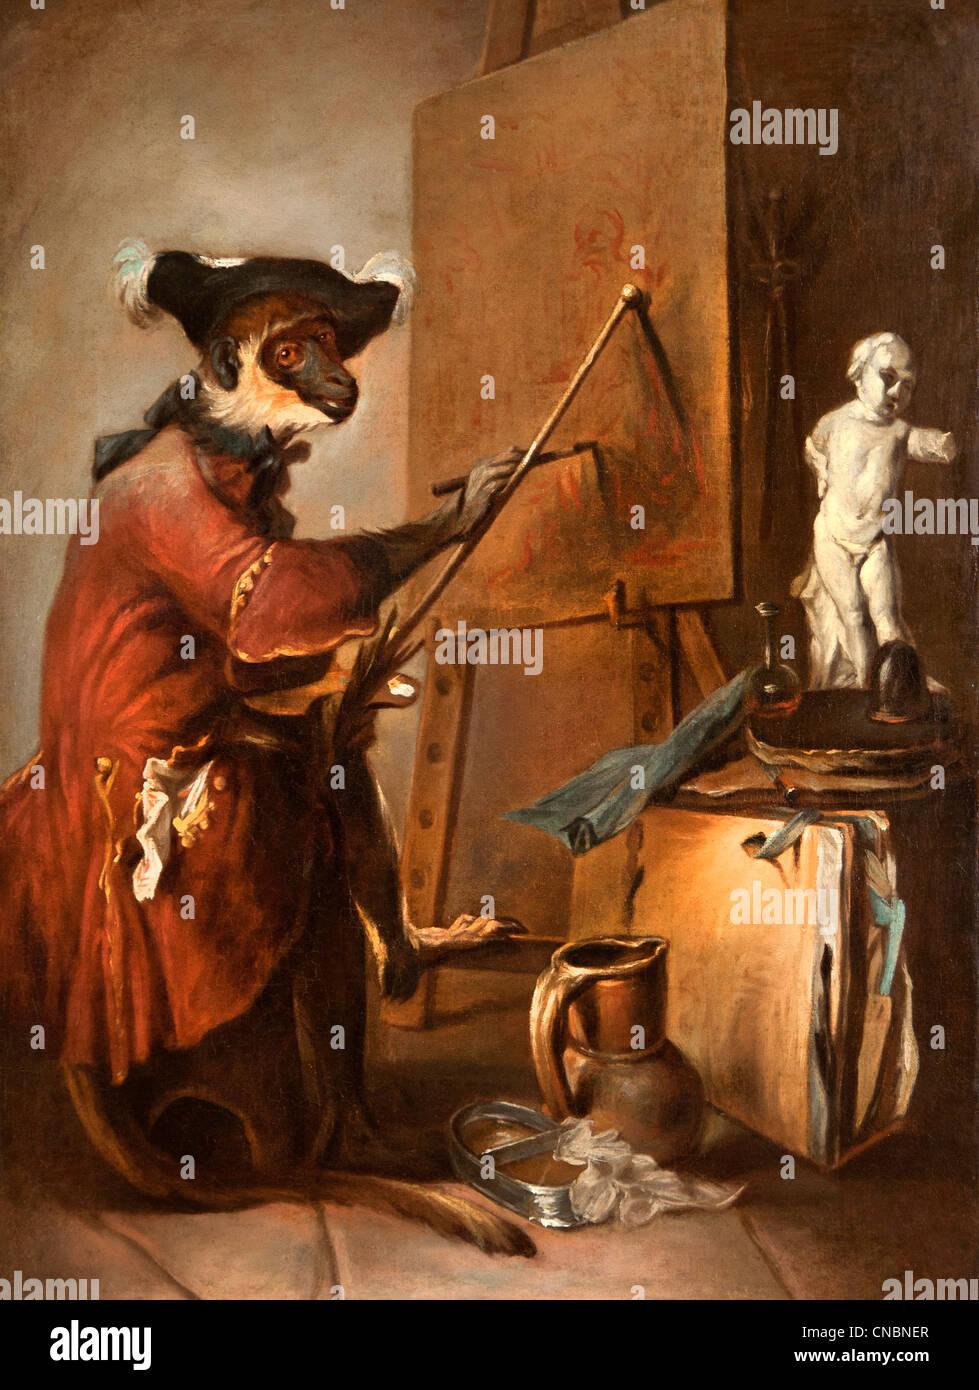 Le singe peintre - The Monkey Painter Jean Simeon Chardin  1699 – 1779 France French - Stock Image